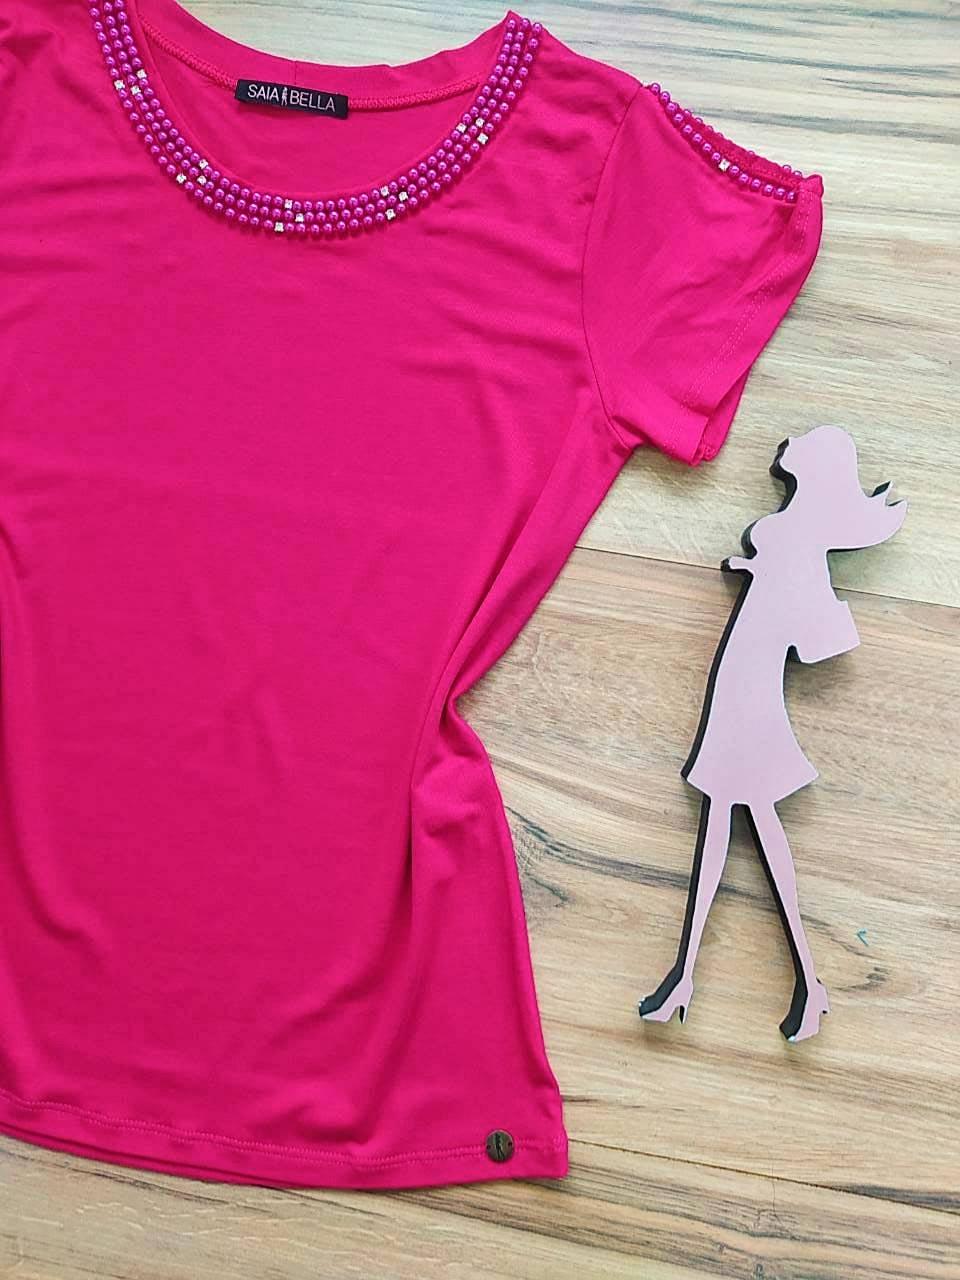 Blusa Rute  Saia Bella - SB41256 Pink